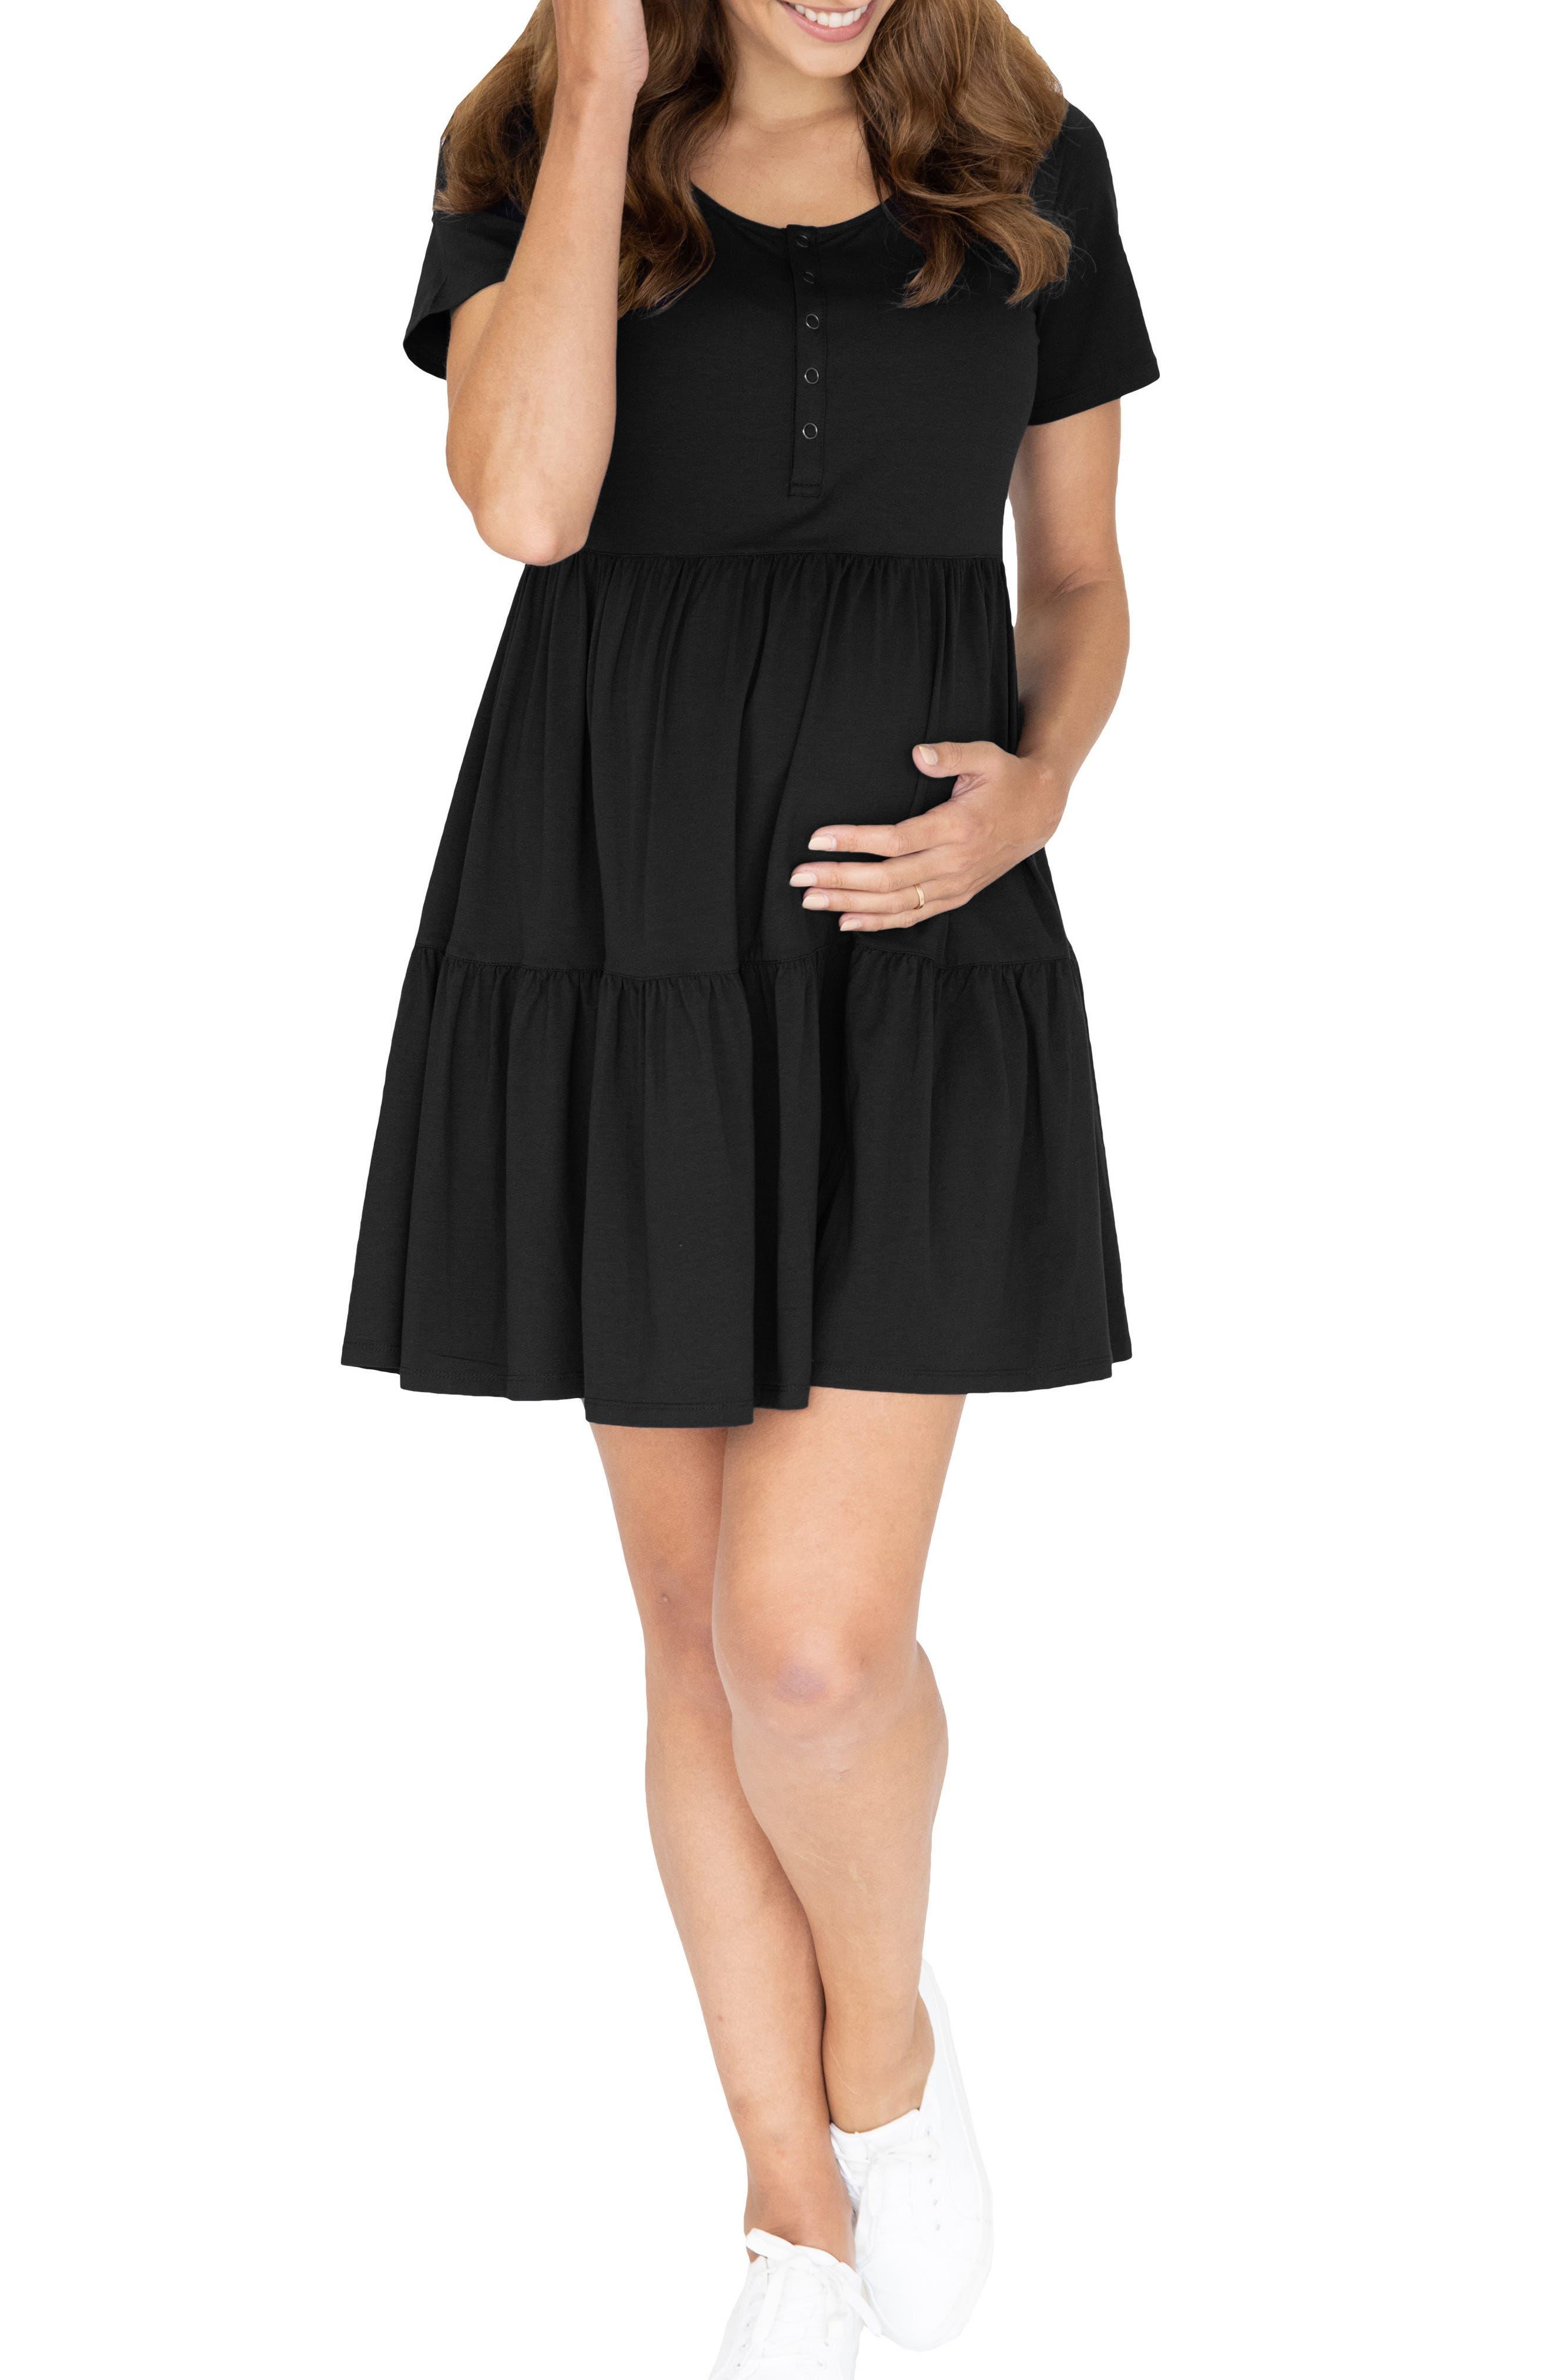 Tiered Maternity/nursing Dress